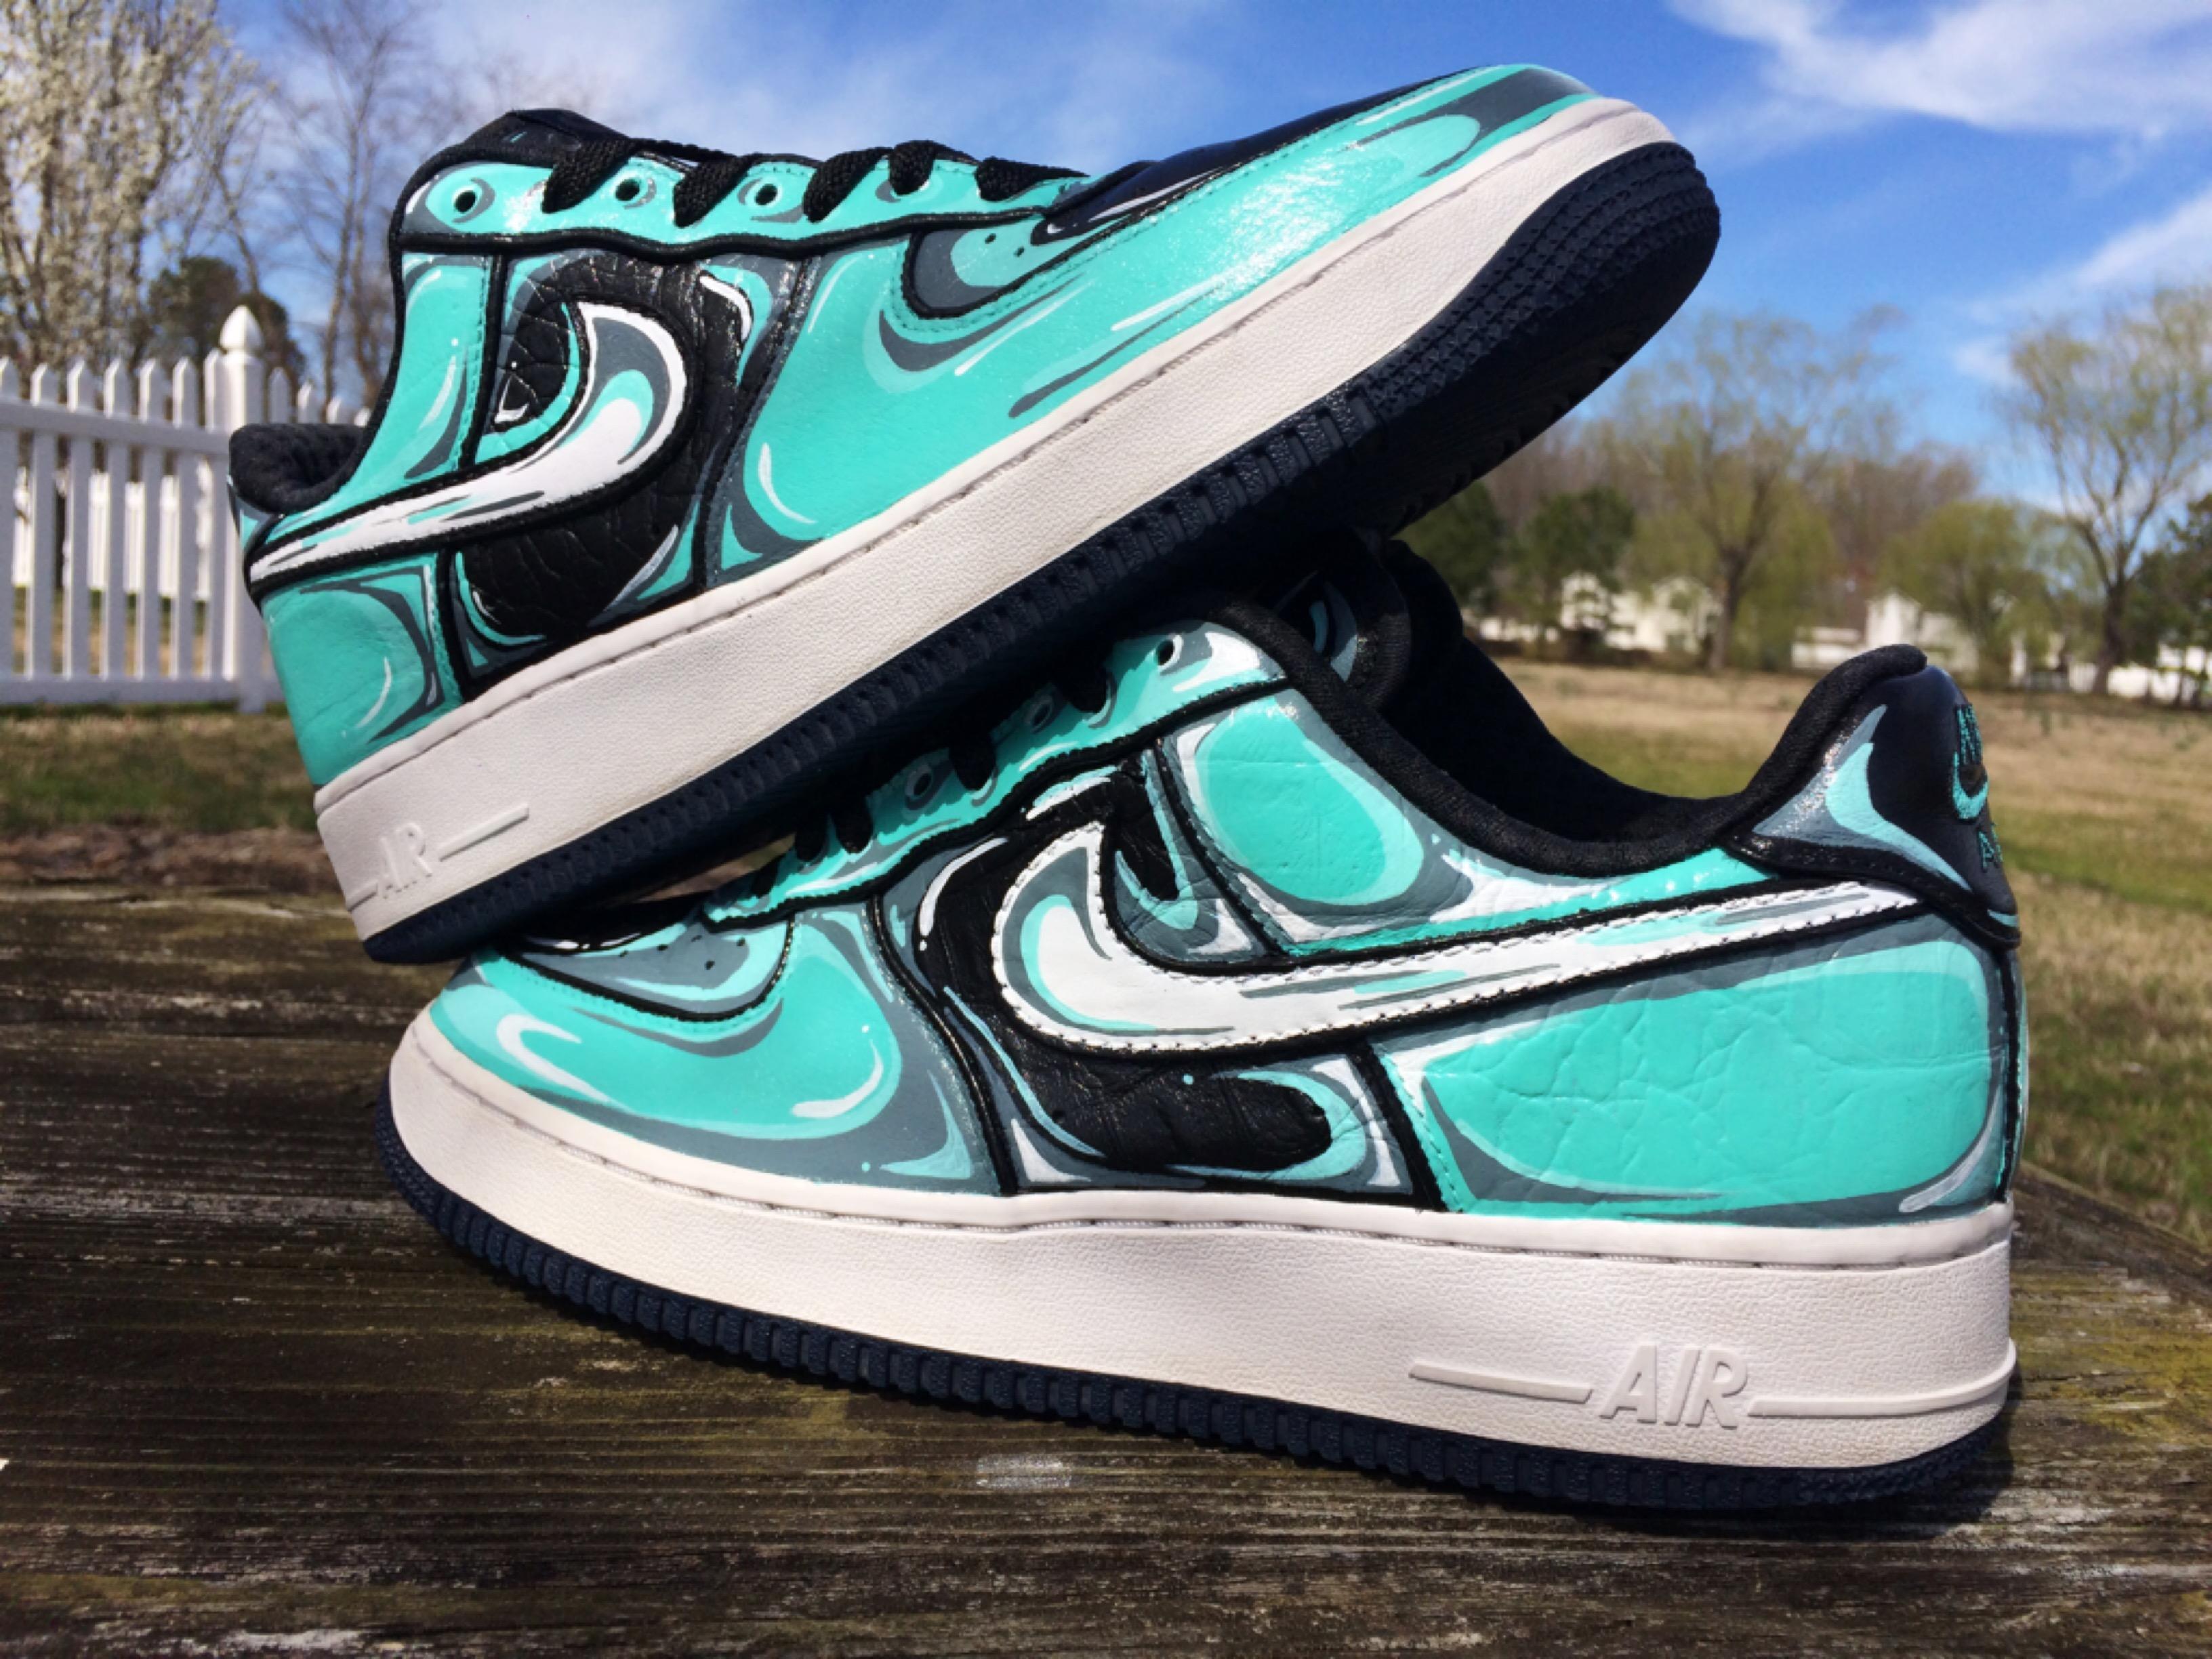 07 On 1 By Premium Gigi Sneaker Aqua Air Force Nike Custom Rodgers b76fgy